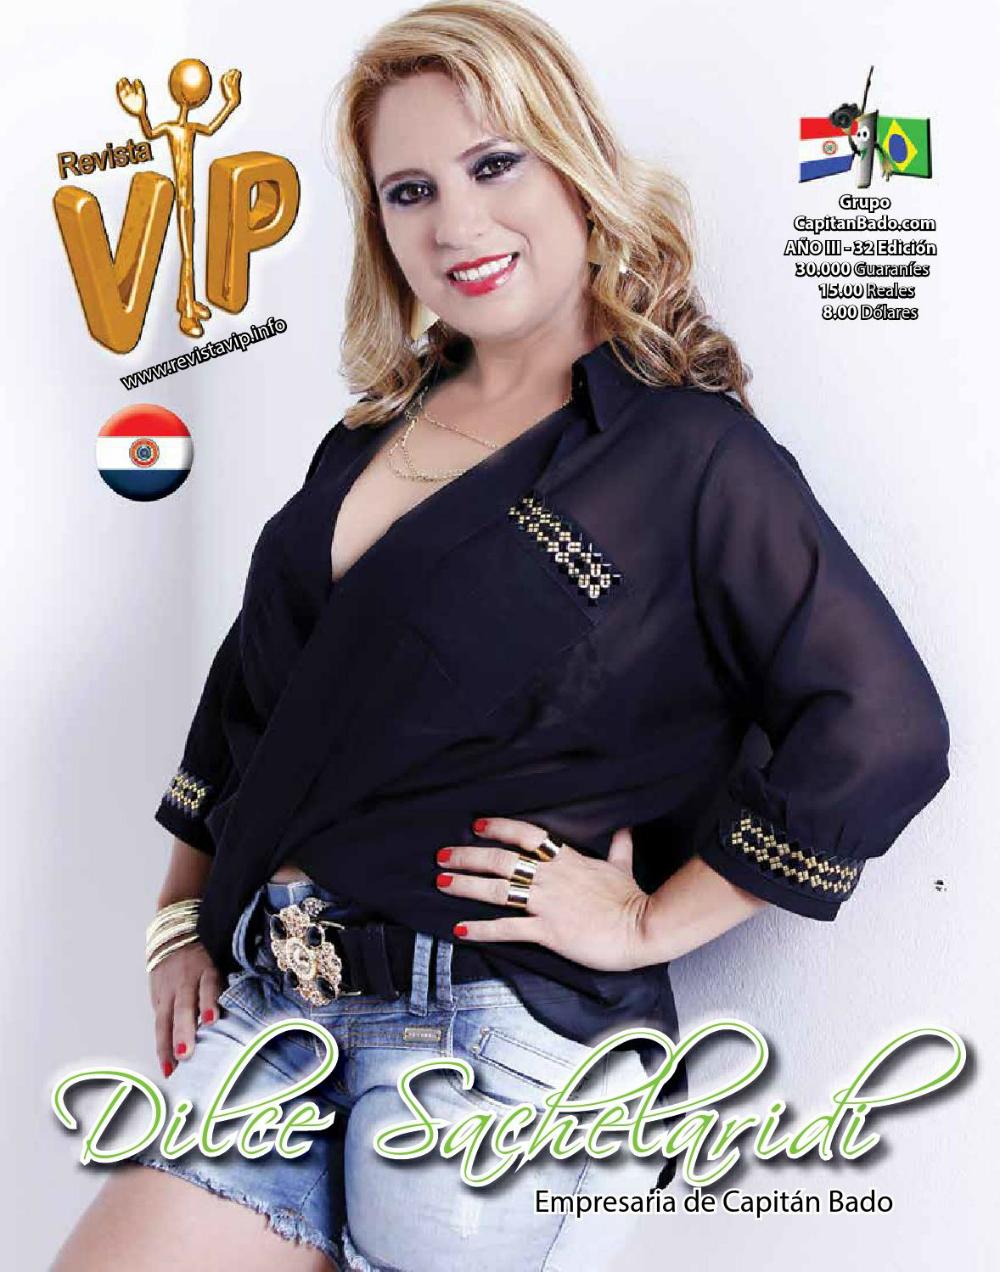 Vip 32 Paraguay